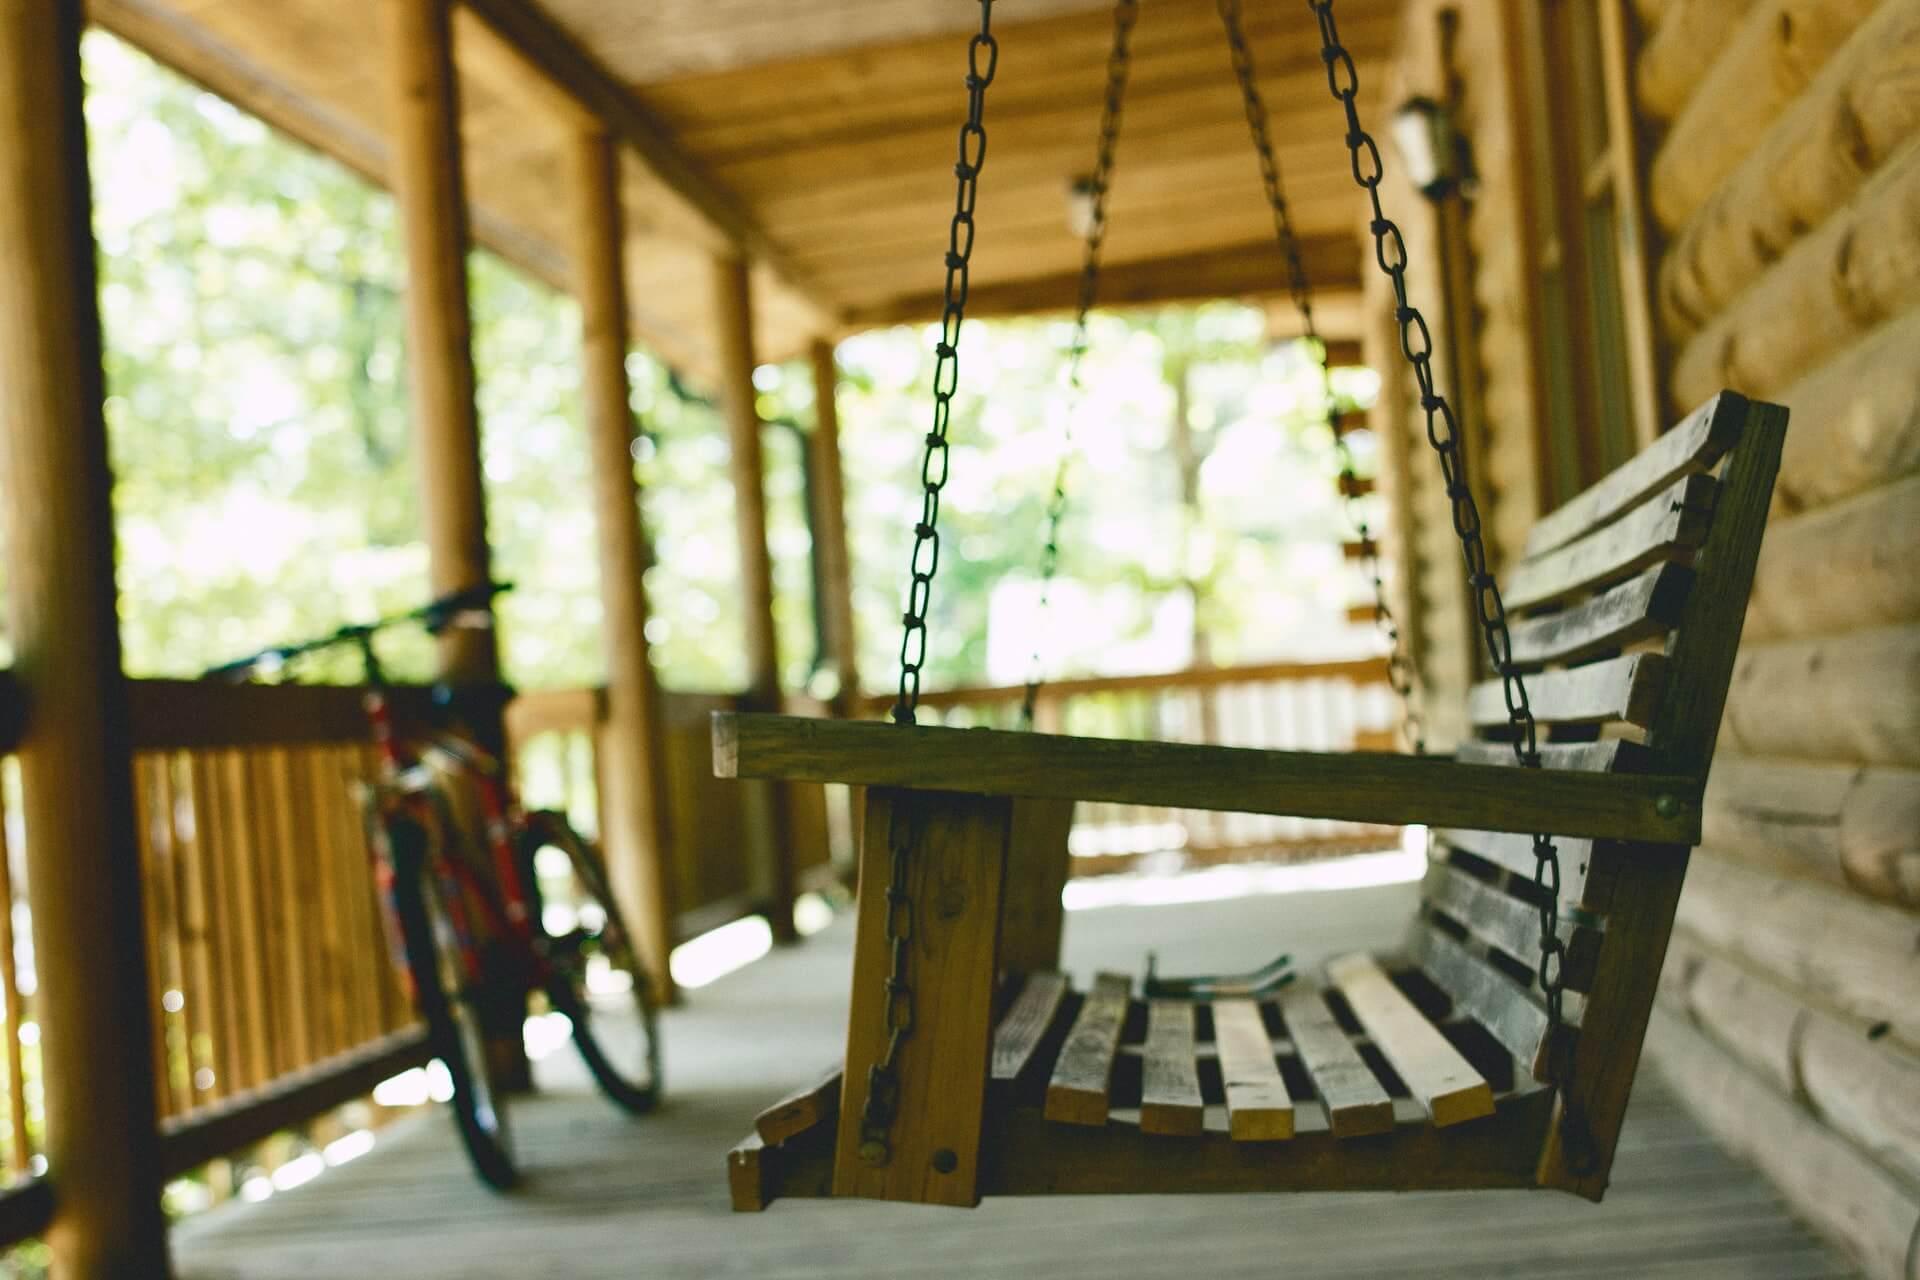 Romantic Getaways Cabins in Smoky Mountain, TN